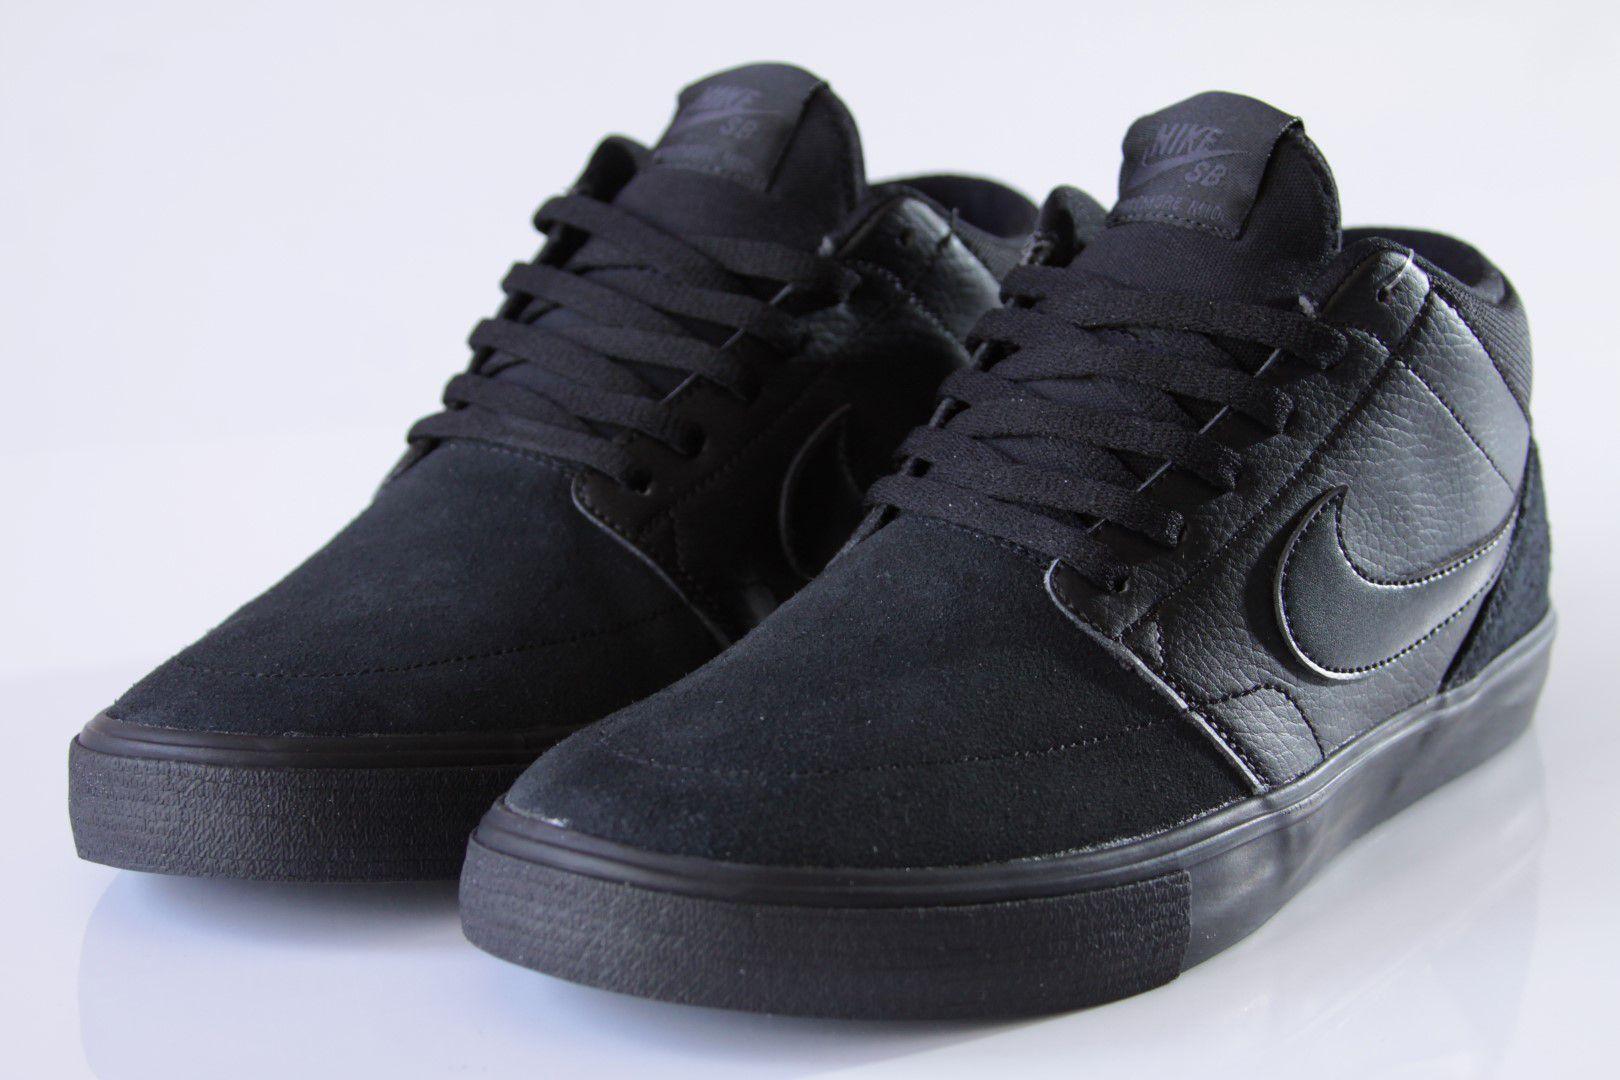 Tênis Nike SB - Portmore II Solarsoft Mid Black/Black-Anthracite  - No Comply Skate Shop